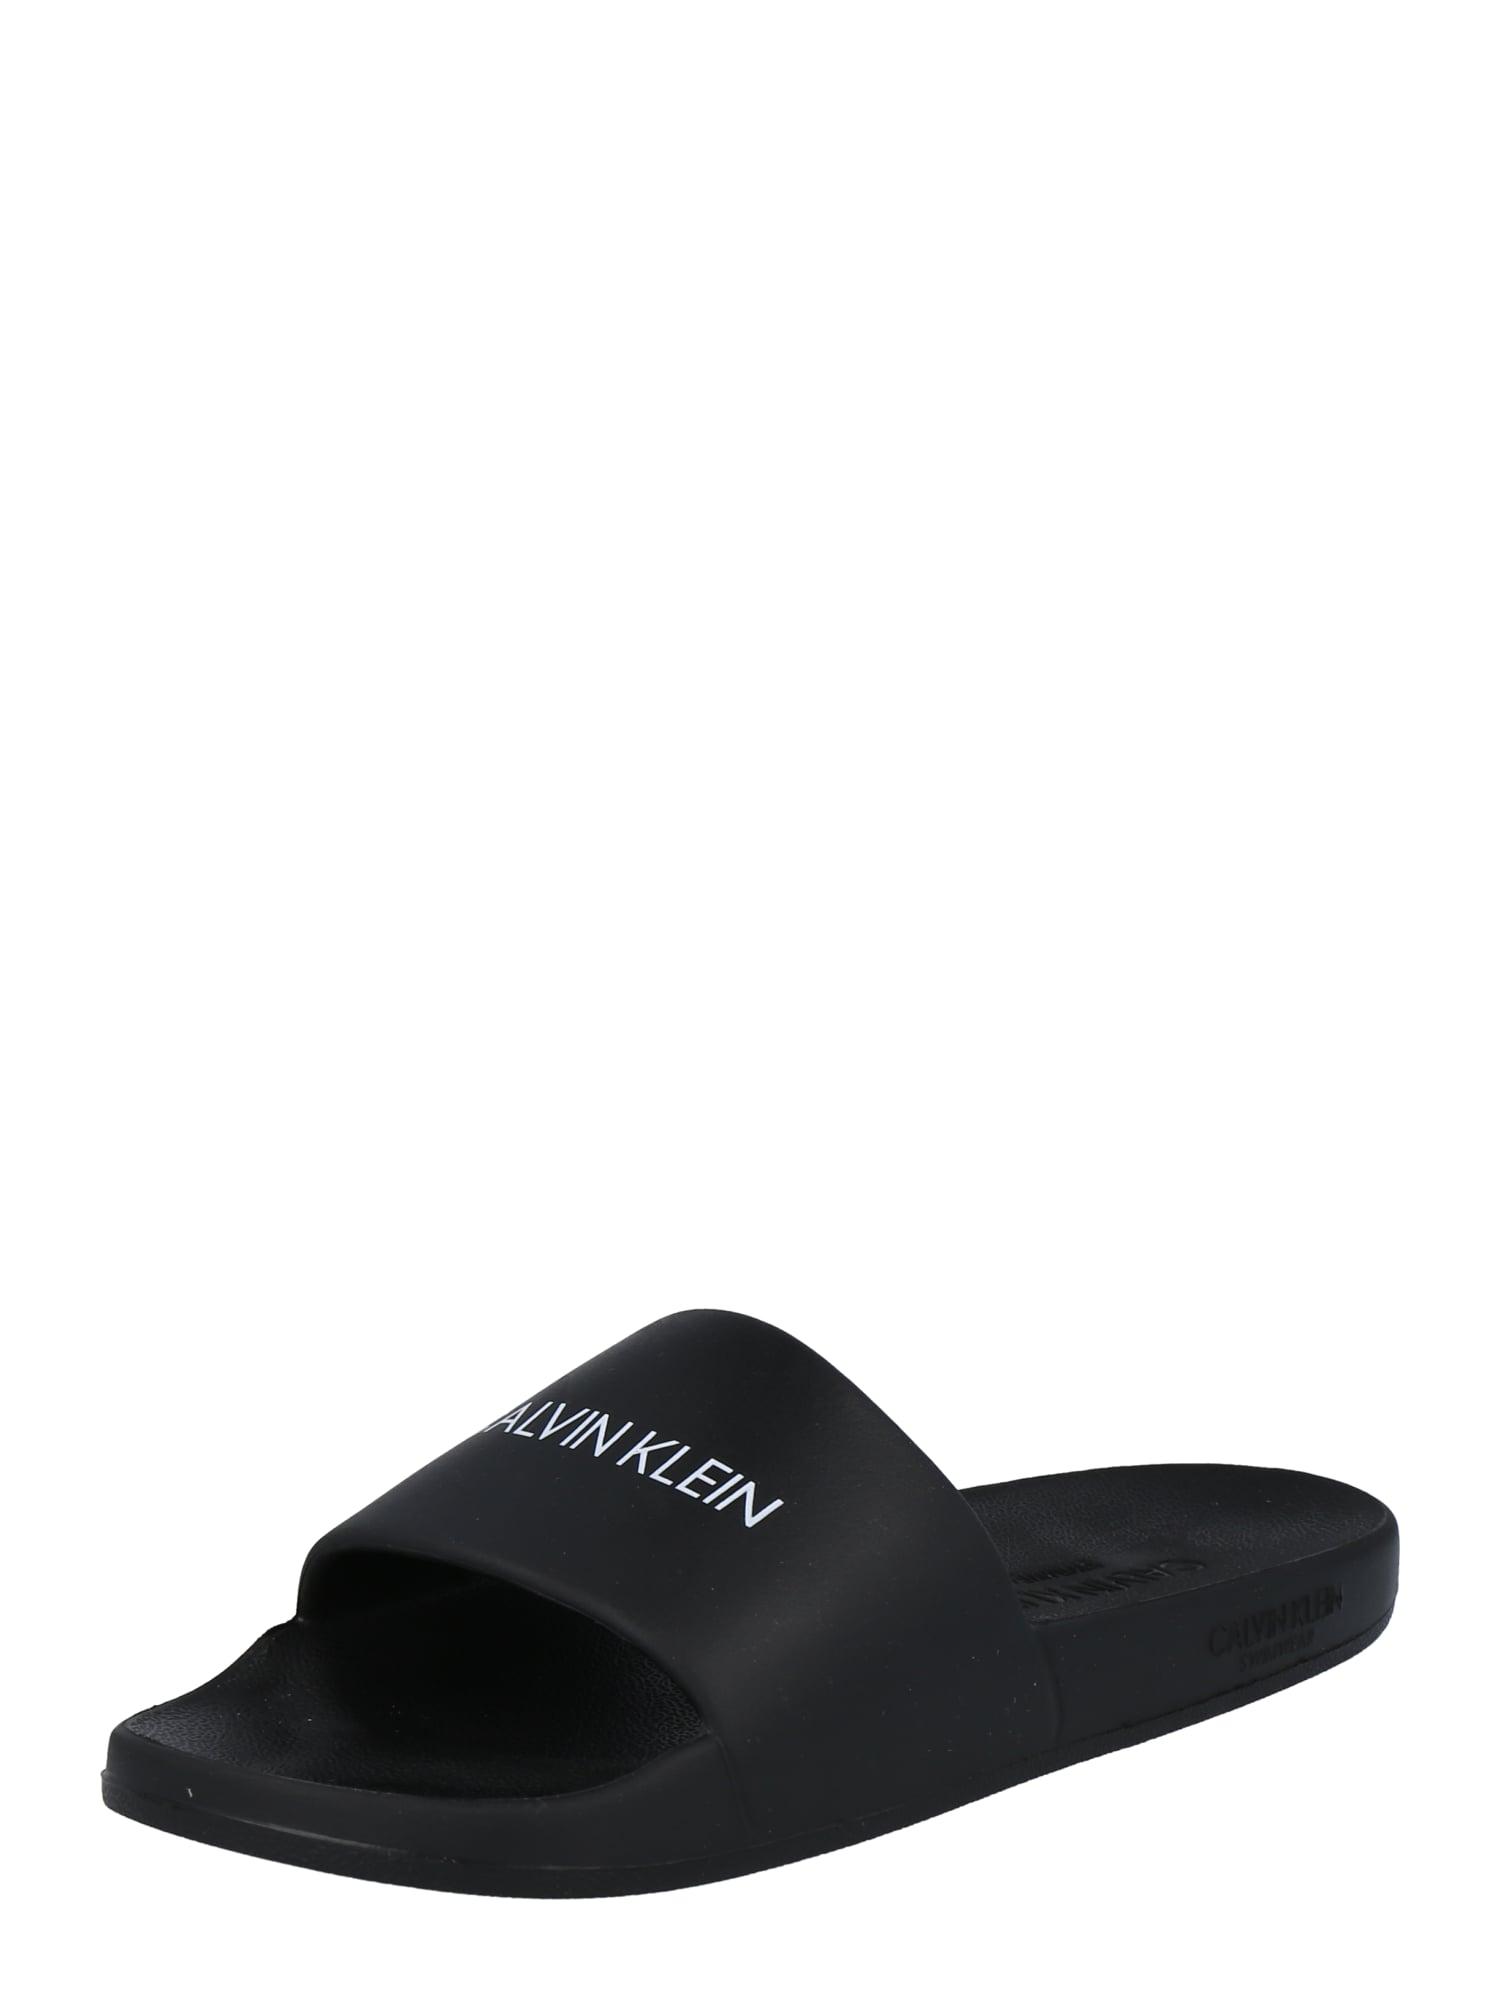 Calvin Klein Swimwear Atviri batai 'ONE MOLD SLIDE' juoda / balta